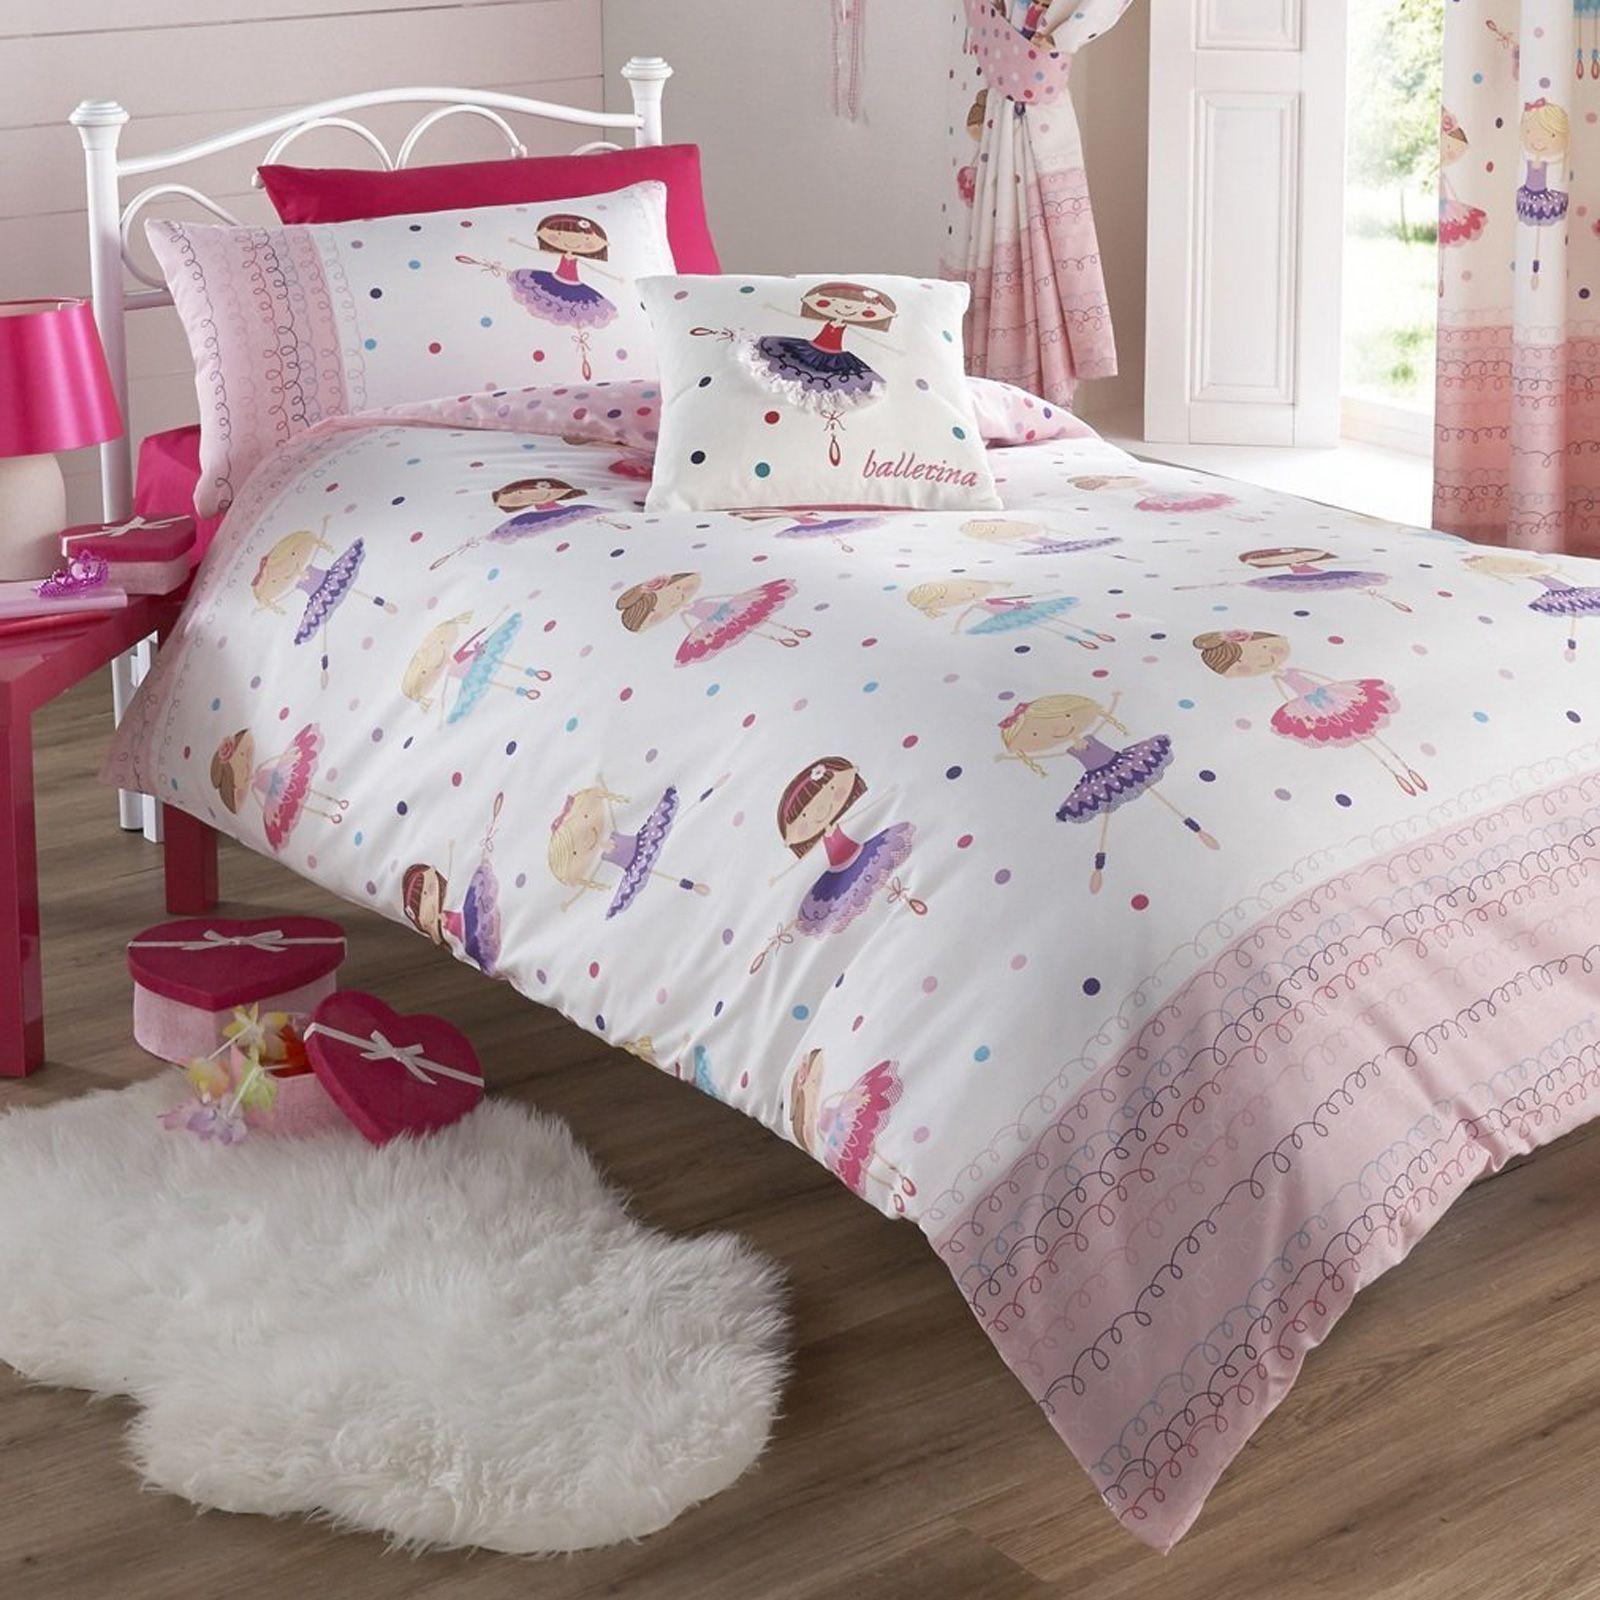 ballerina design bettbezug sets in verschiedenen gr en m dchen bettw sche ebay. Black Bedroom Furniture Sets. Home Design Ideas